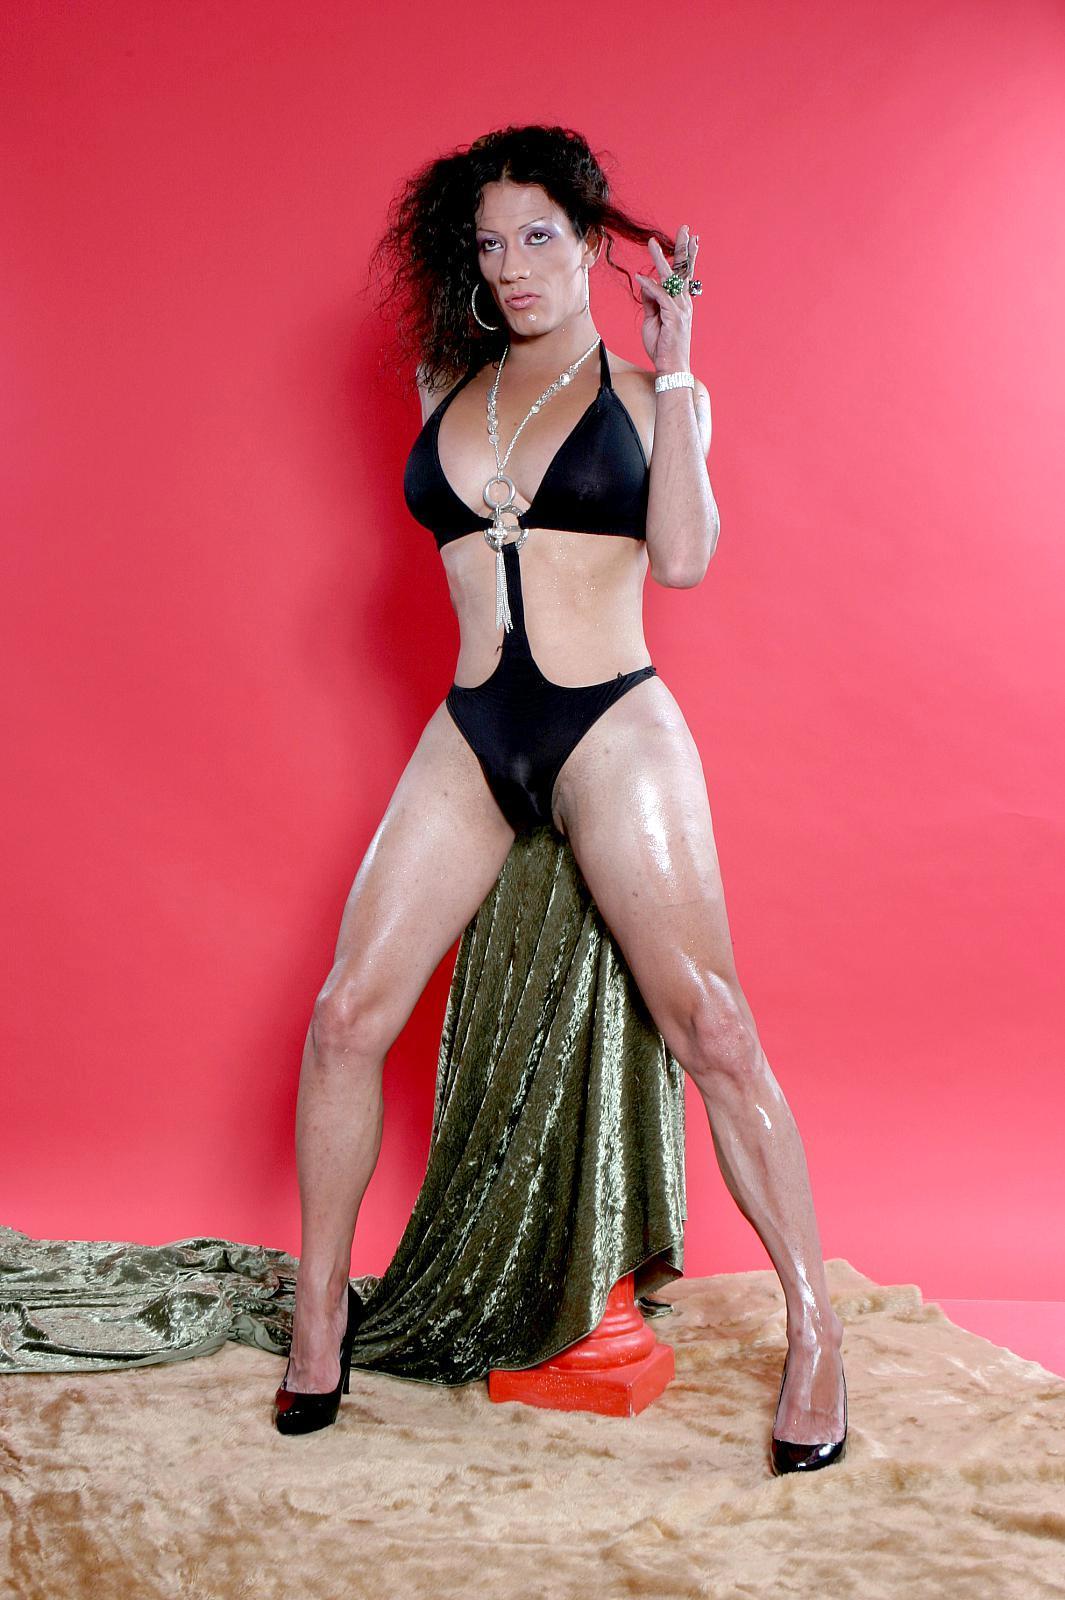 Naughty Latina T-Girl Karen Masturbates On Camera As She Teas